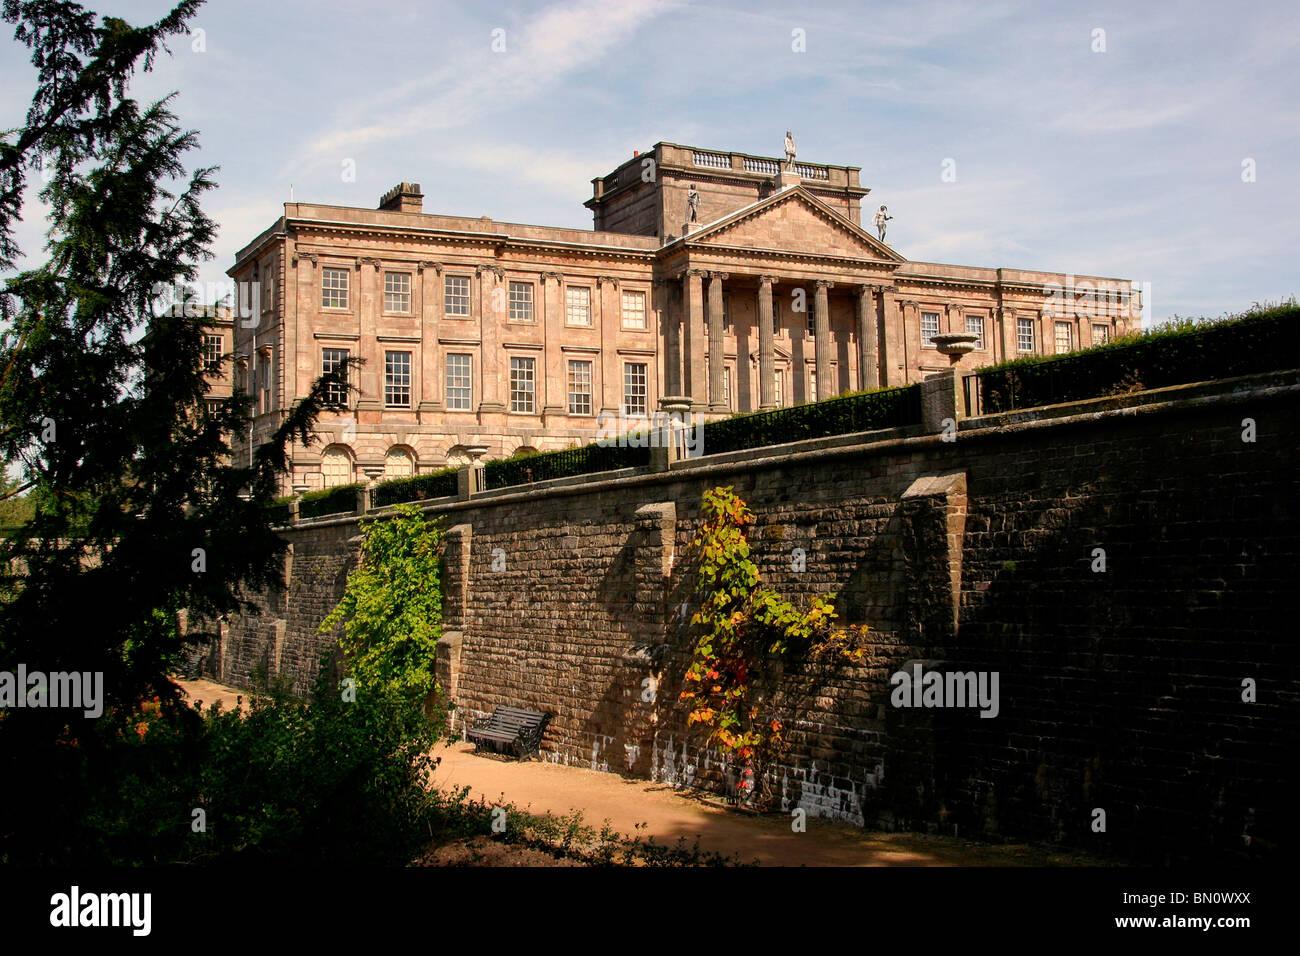 Italianate Garden Stock Photos & Italianate Garden Stock Images - Alamy